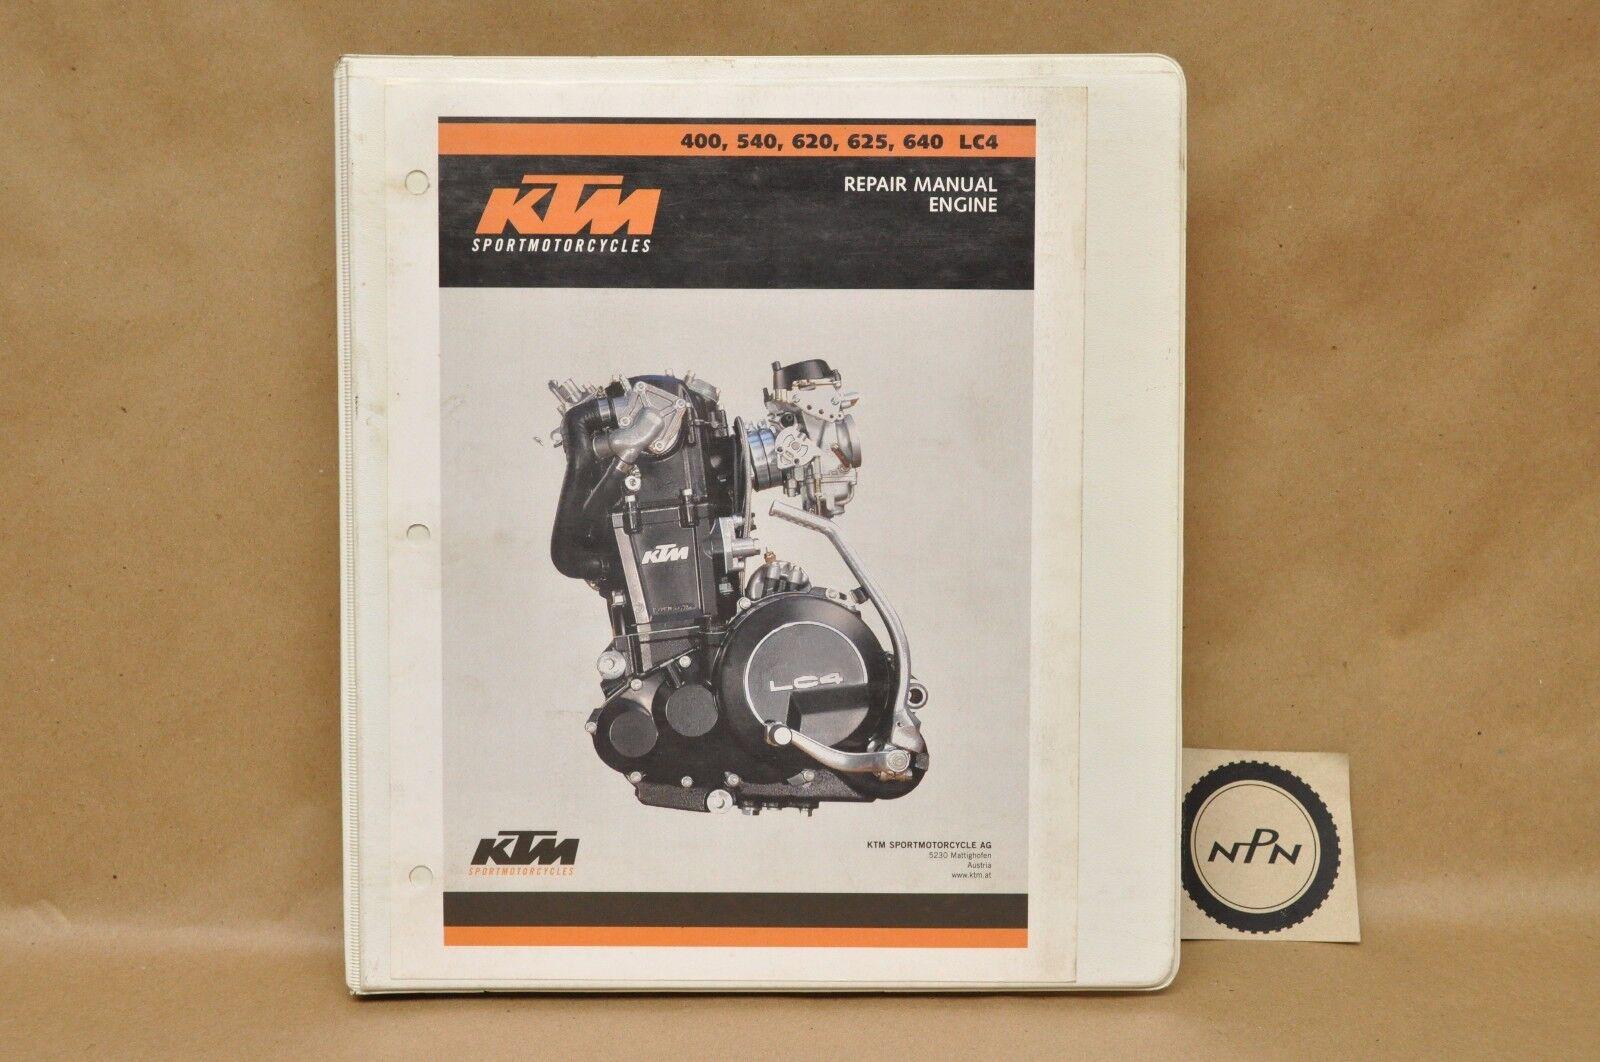 ktm sportmotorcycles engine repair manual 400 540 620 625 640 lc4 ebay rh  ebay co uk LC4 KTM Forum LC4 KTM Forum